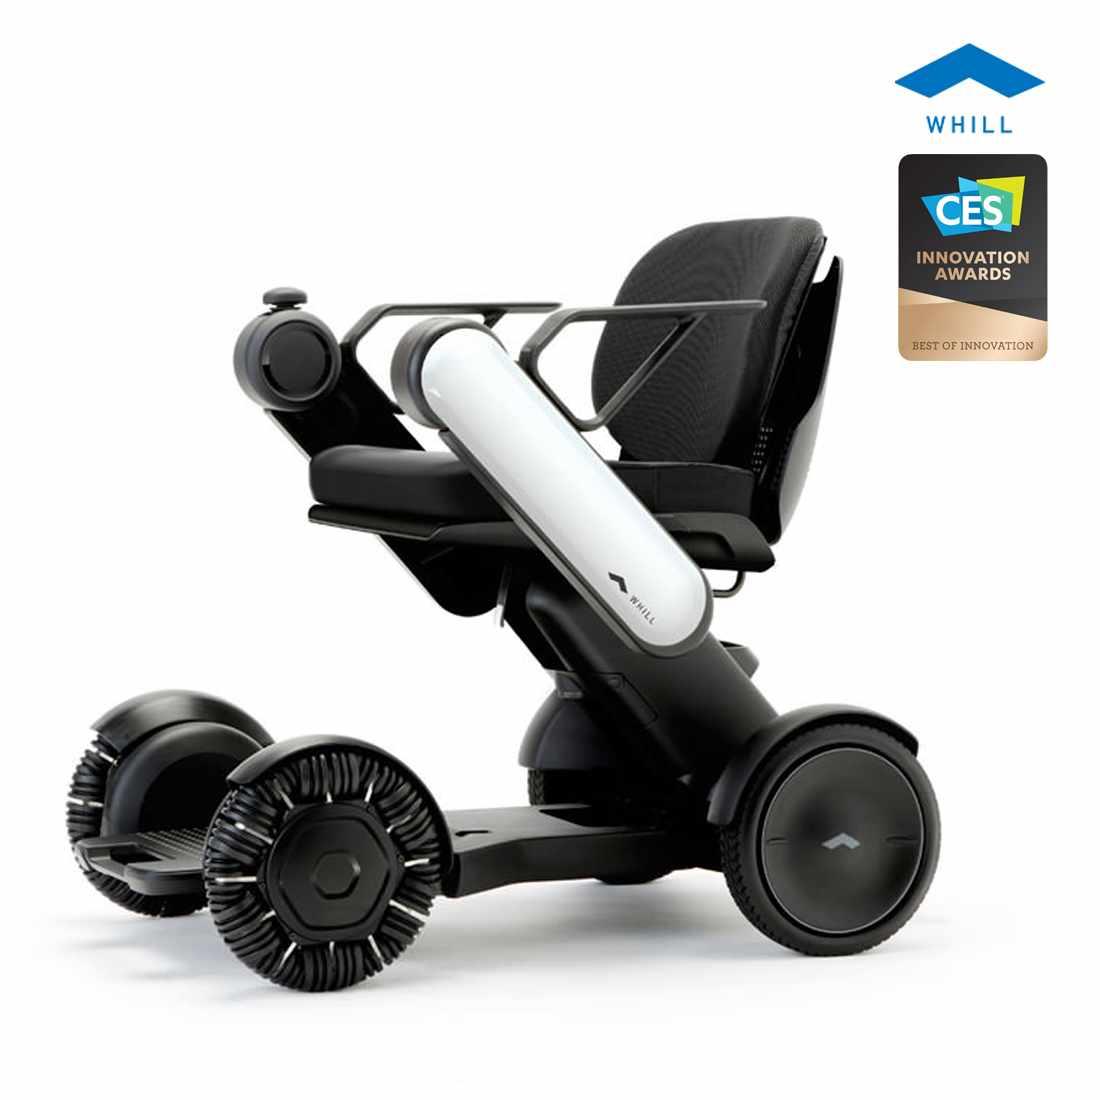 WHILL Model Ci ultra portable power wheelchair